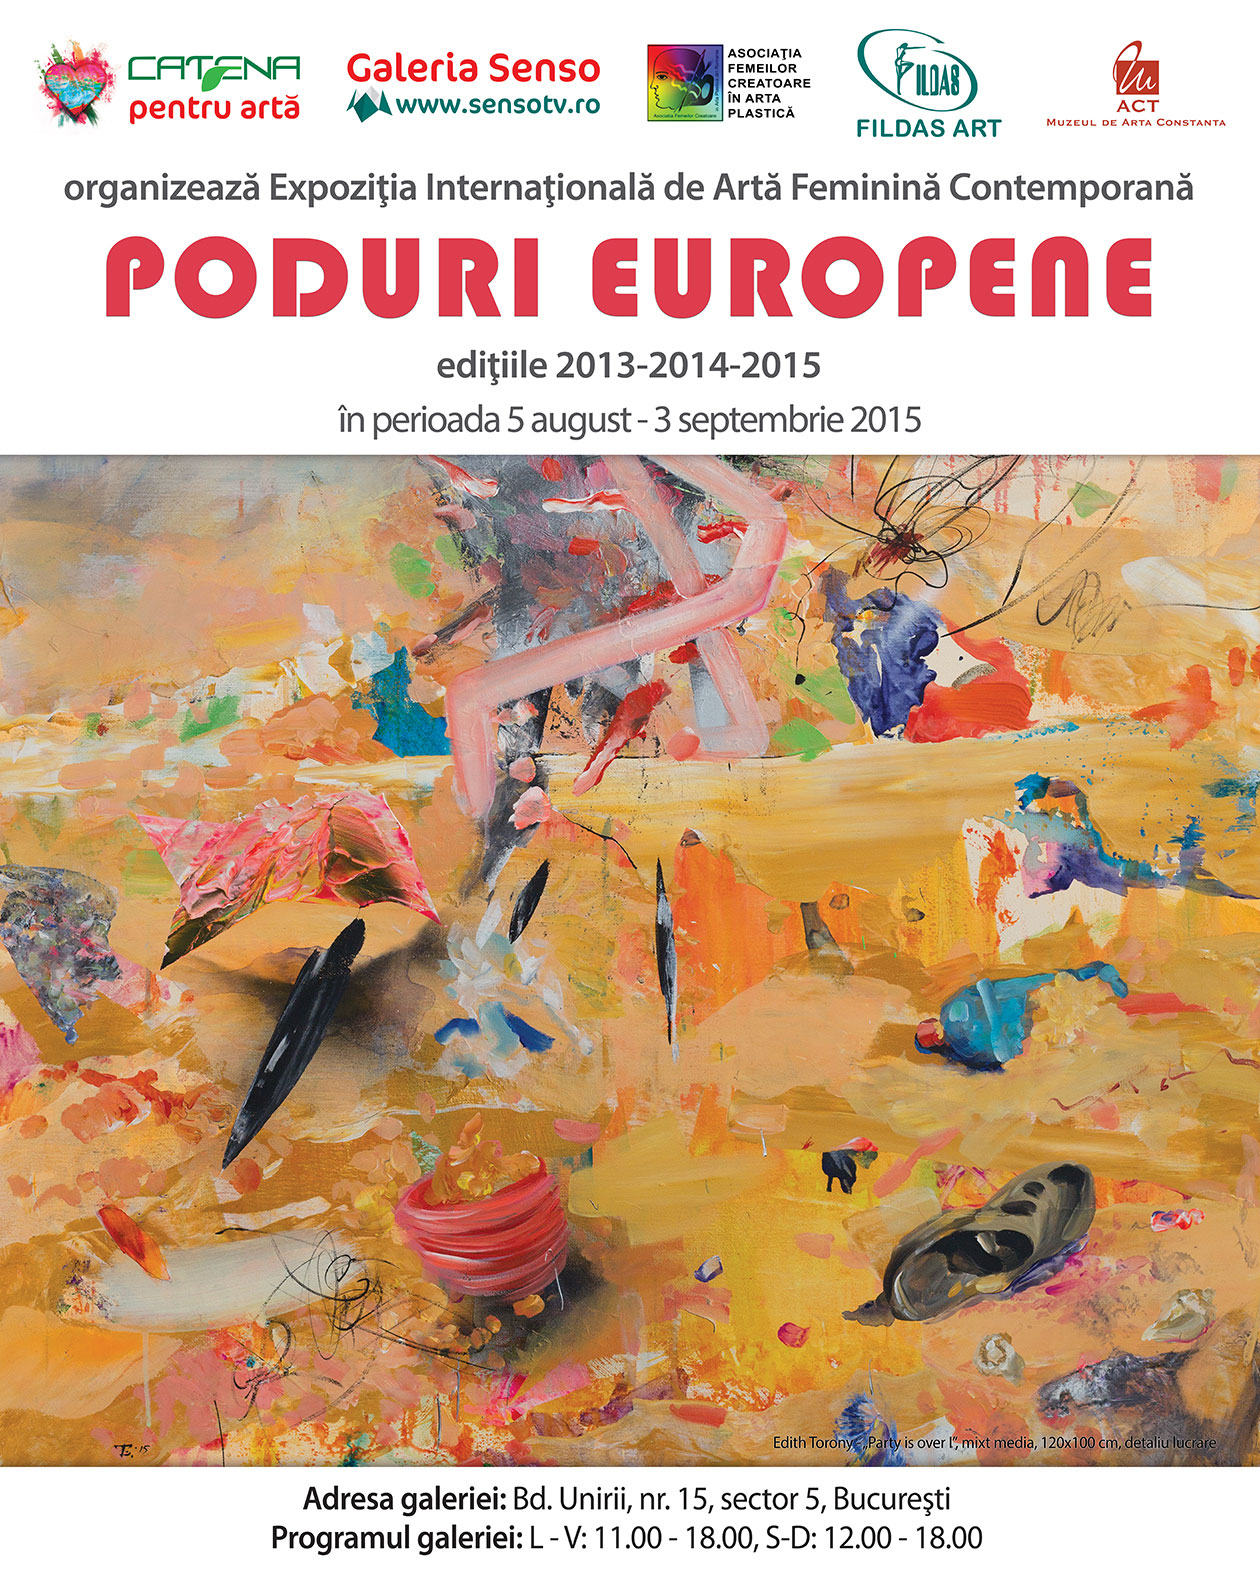 afis-Expo-PODURI-EUROPENE-laGaleria-SENSO